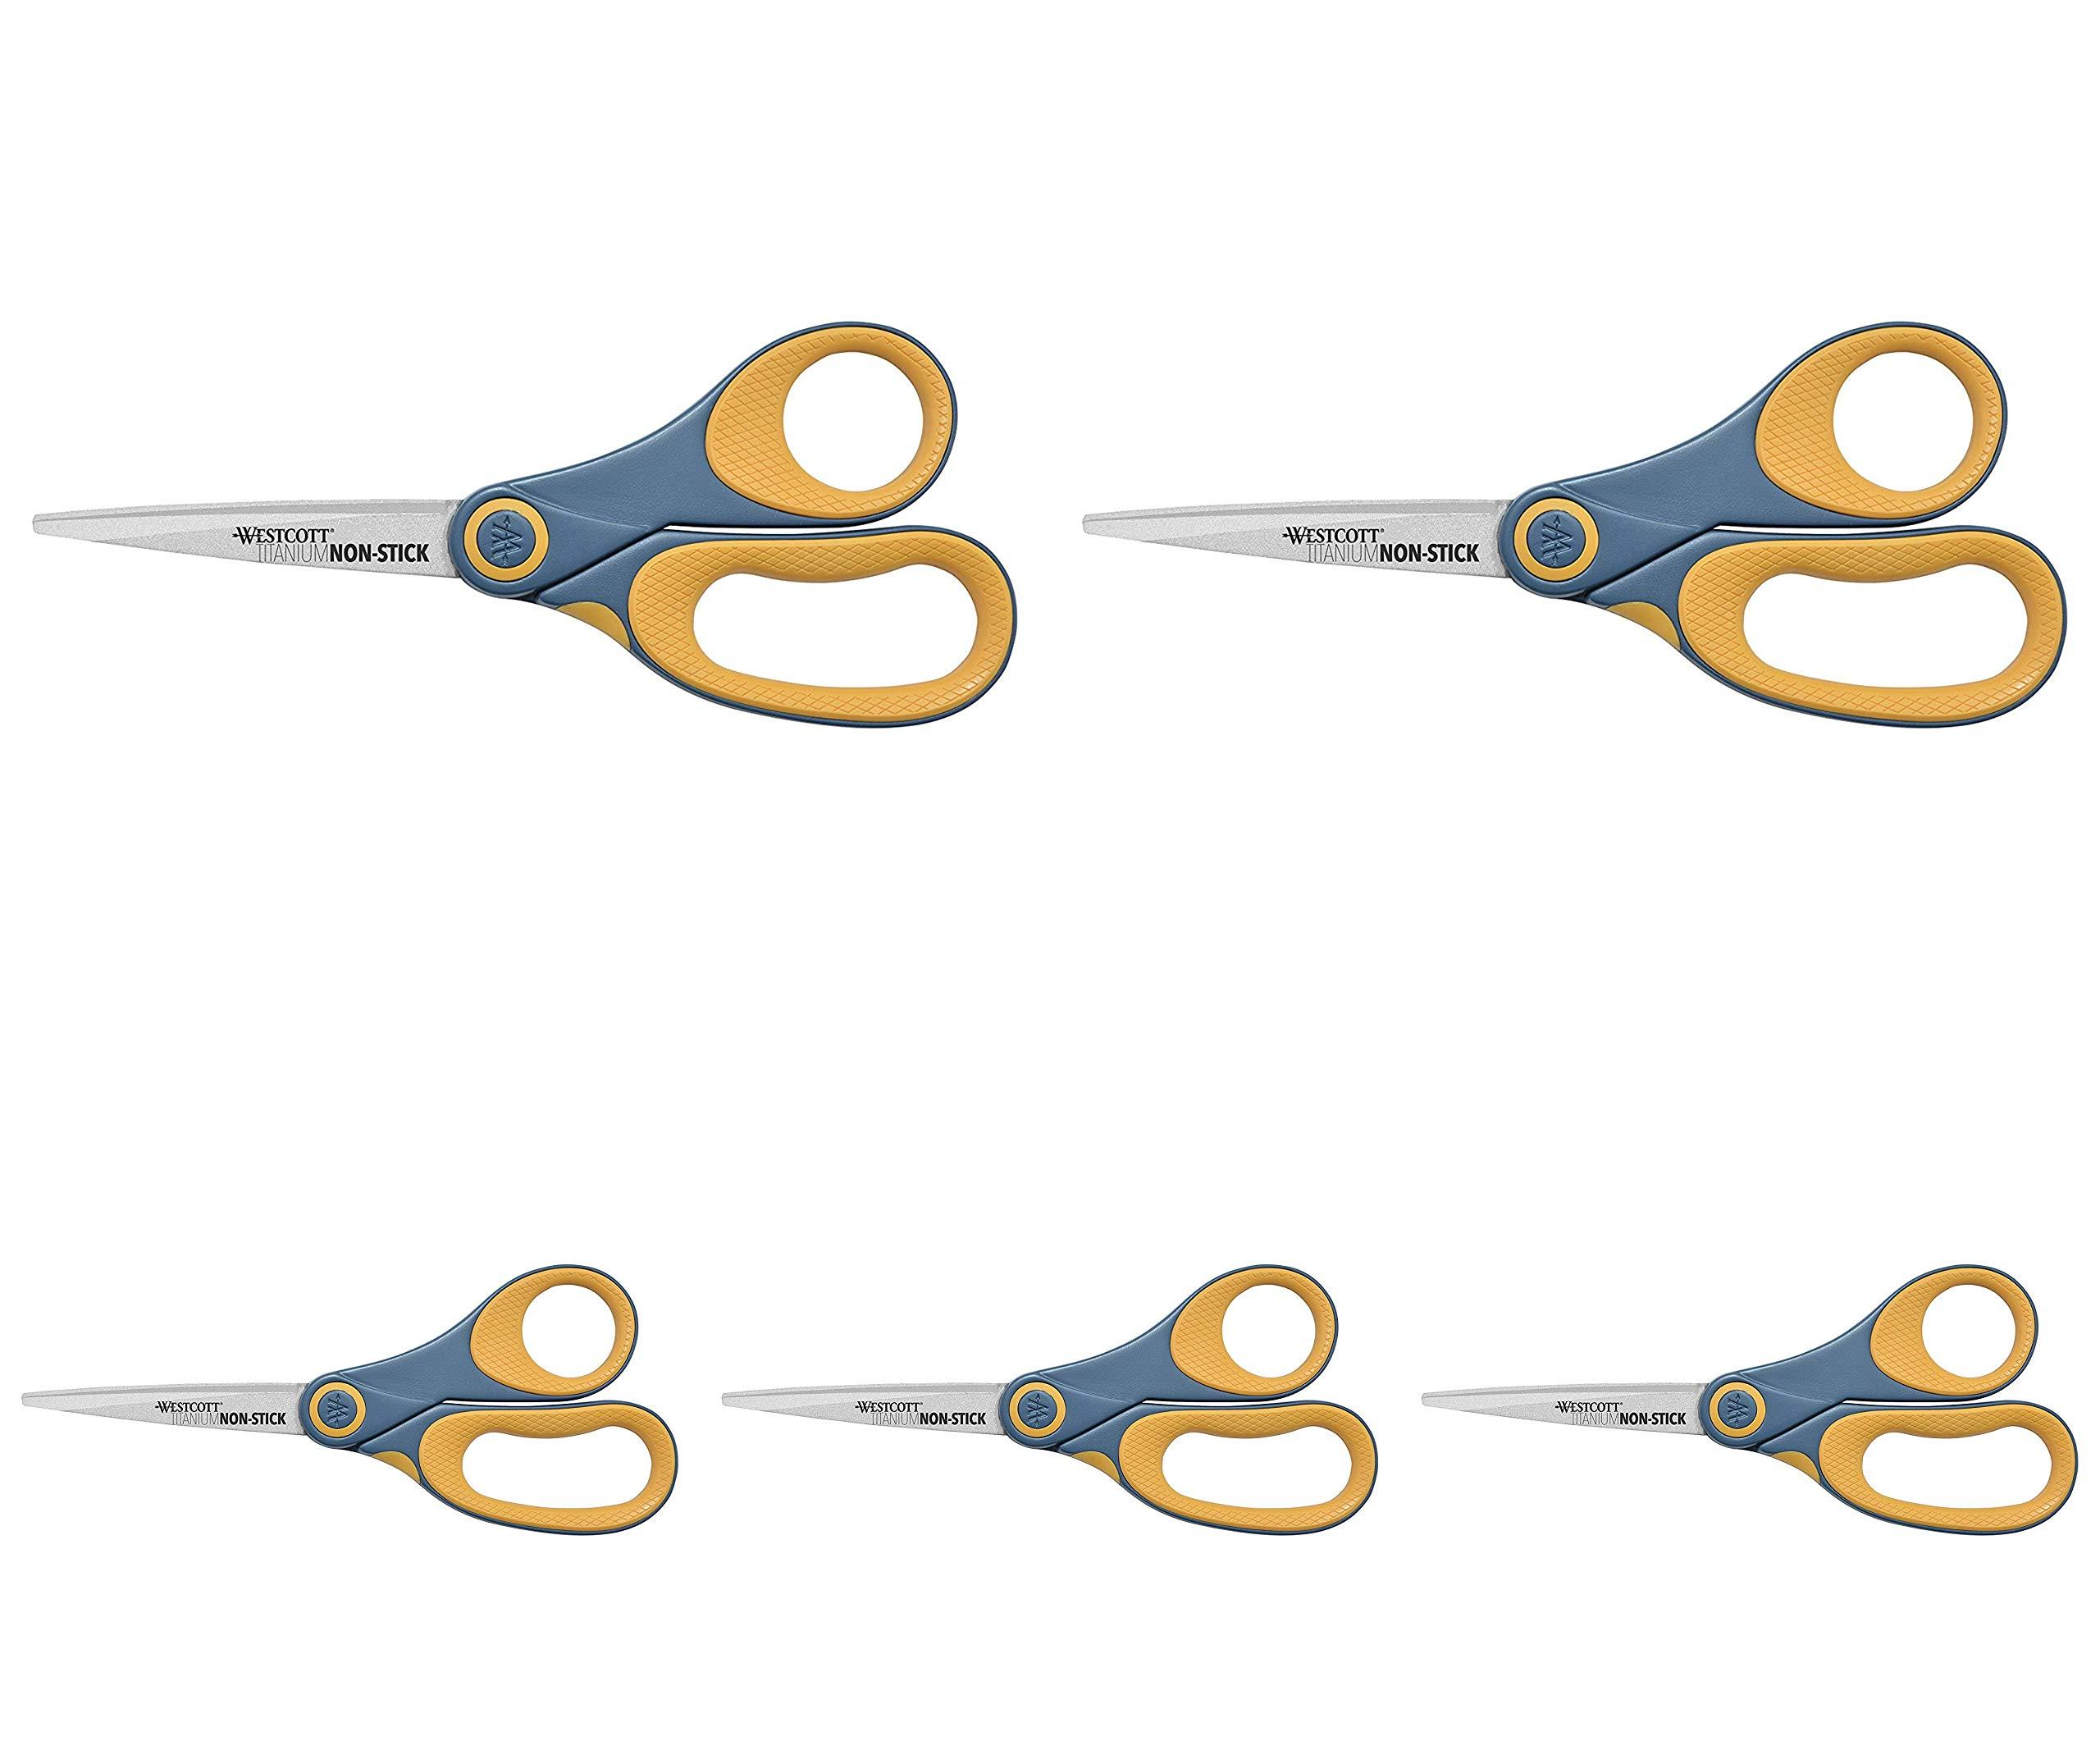 Westcott 14849 8'' Straight Titanium Bonded Non-Stick Scissors by Westcott